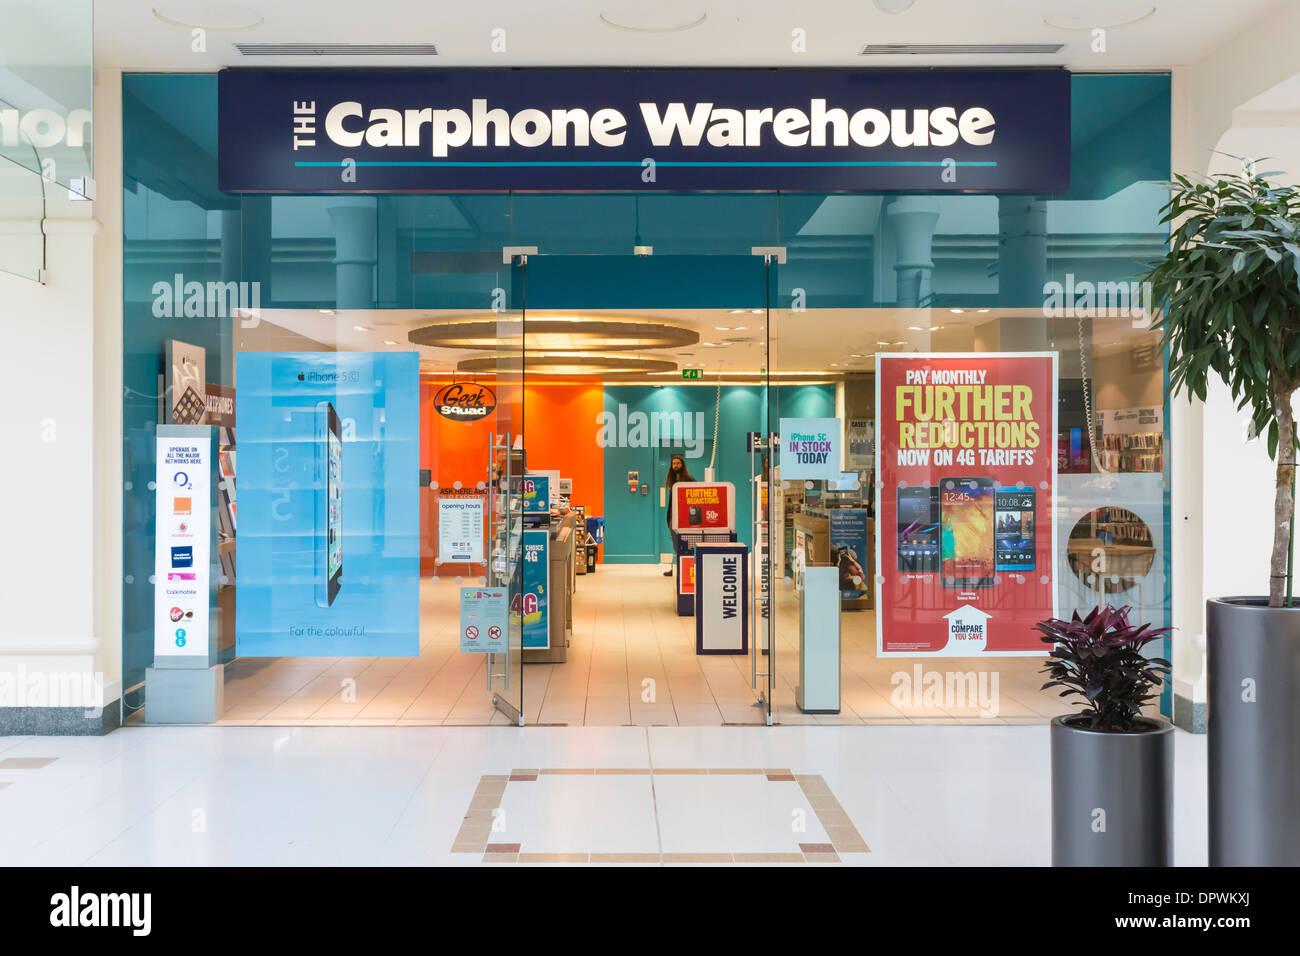 Carphone Warehouse Shop Front Retail - Stock Image